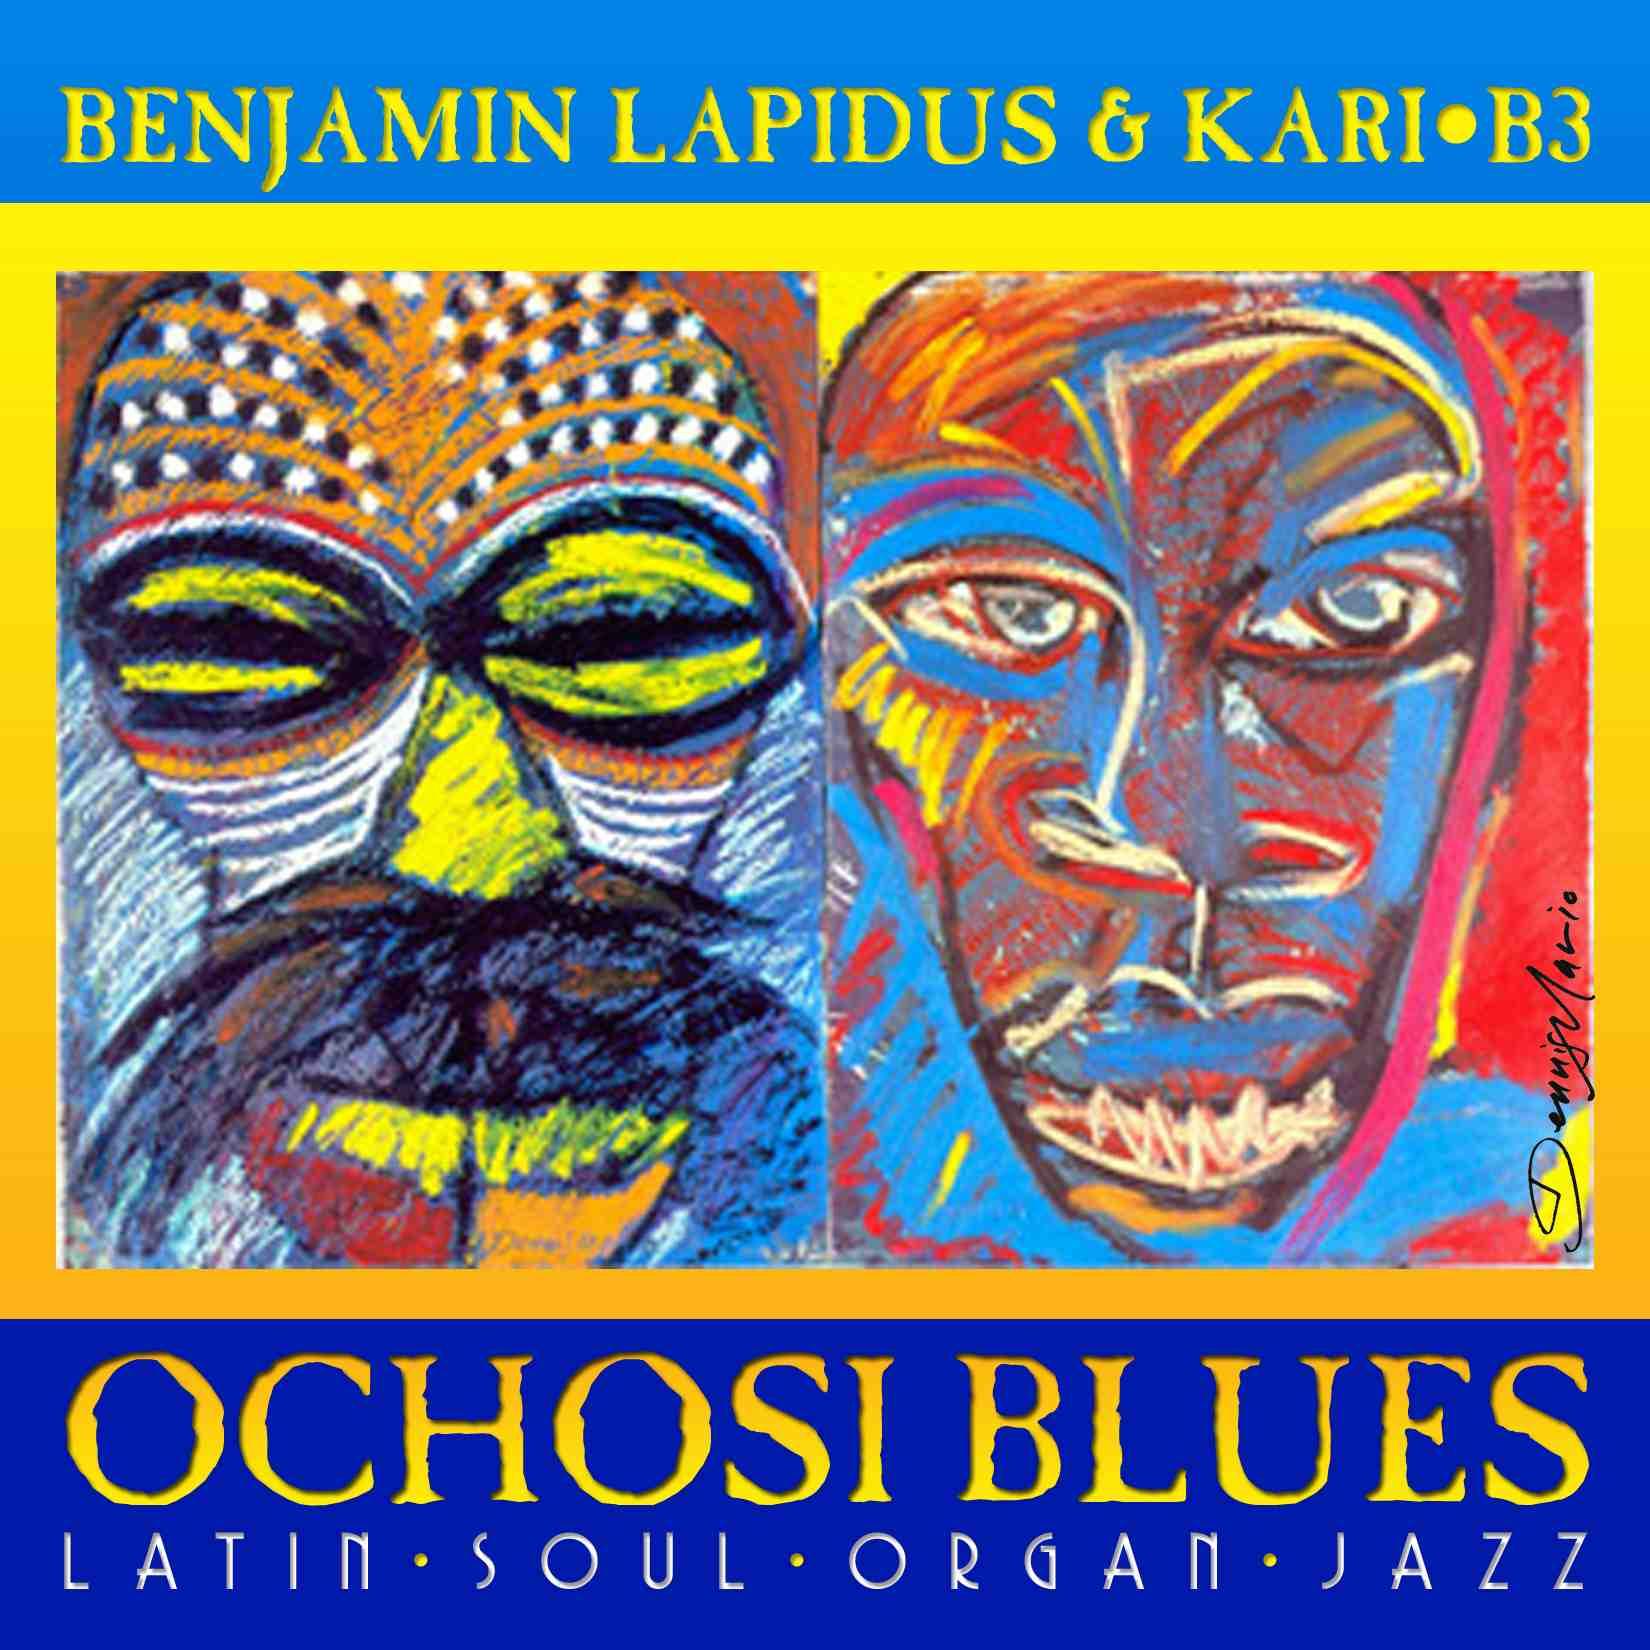 OchosiBlues2 copy